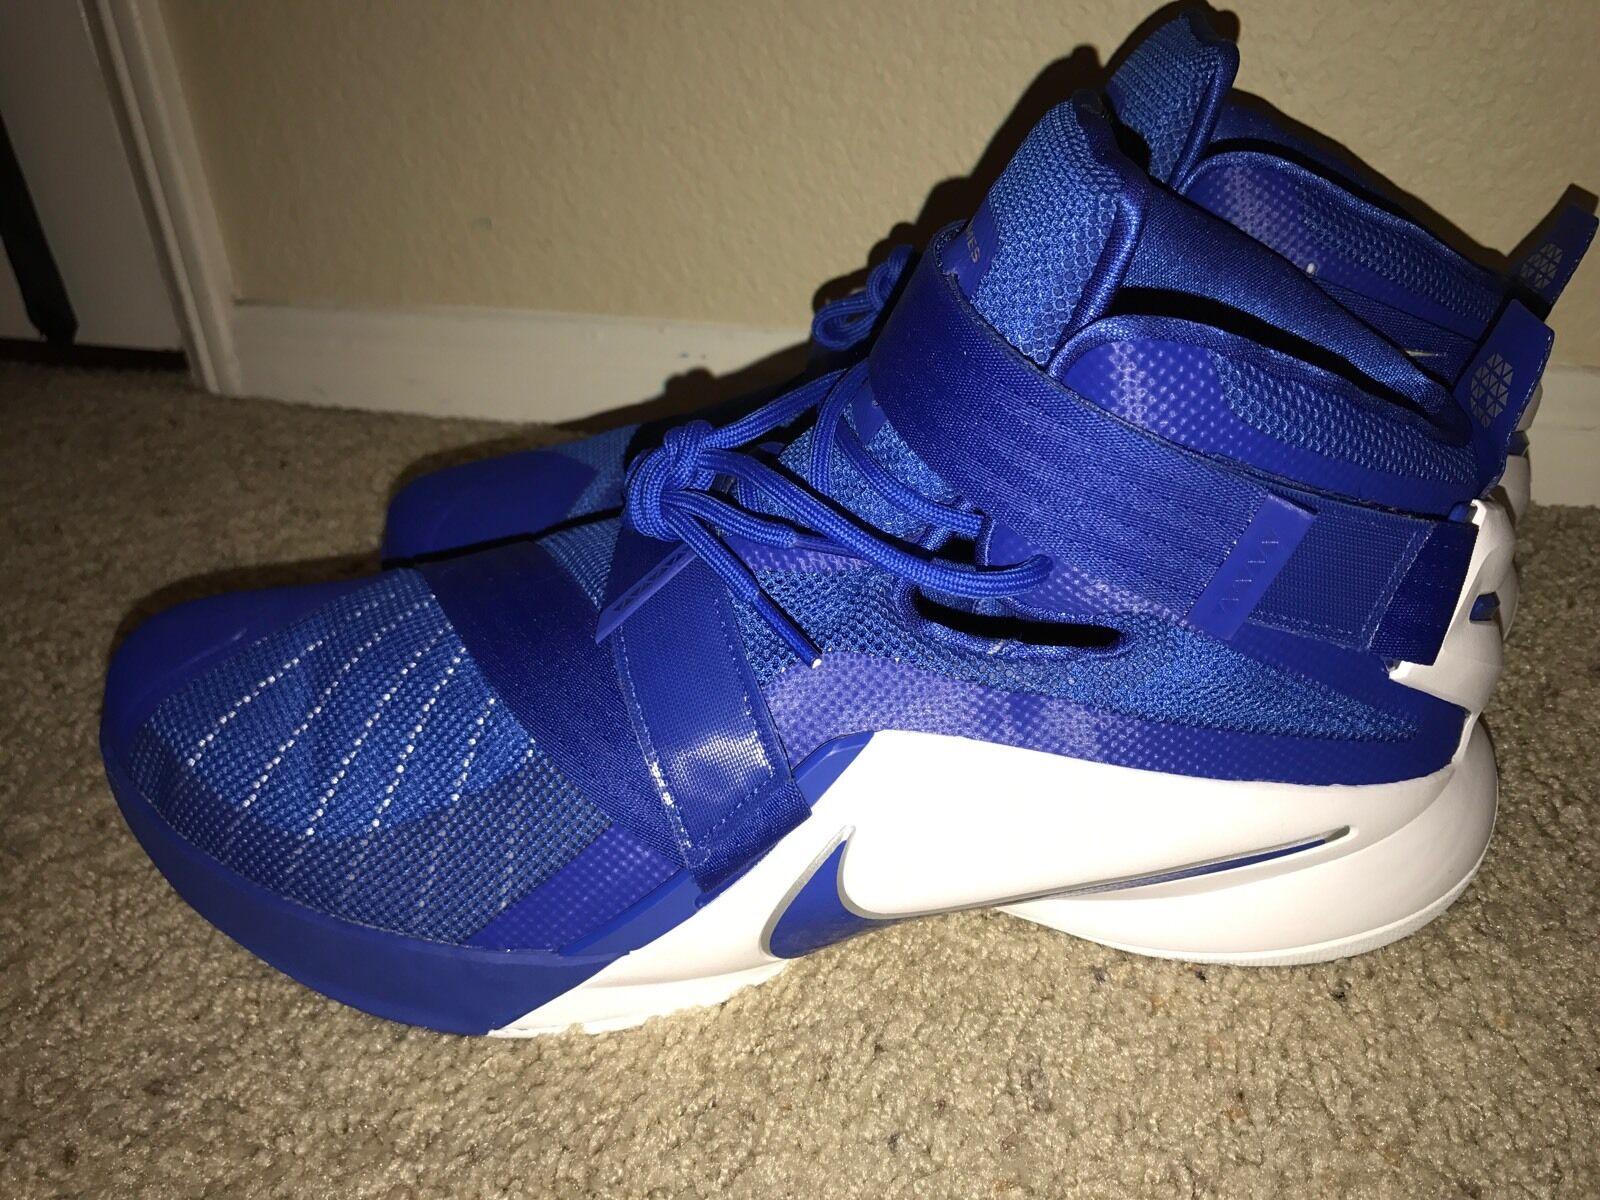 6e1f93cf0413 DS Nike Lebron Soldier IX IX IX 9 TB Men Basketball Shoes Blue White 813264